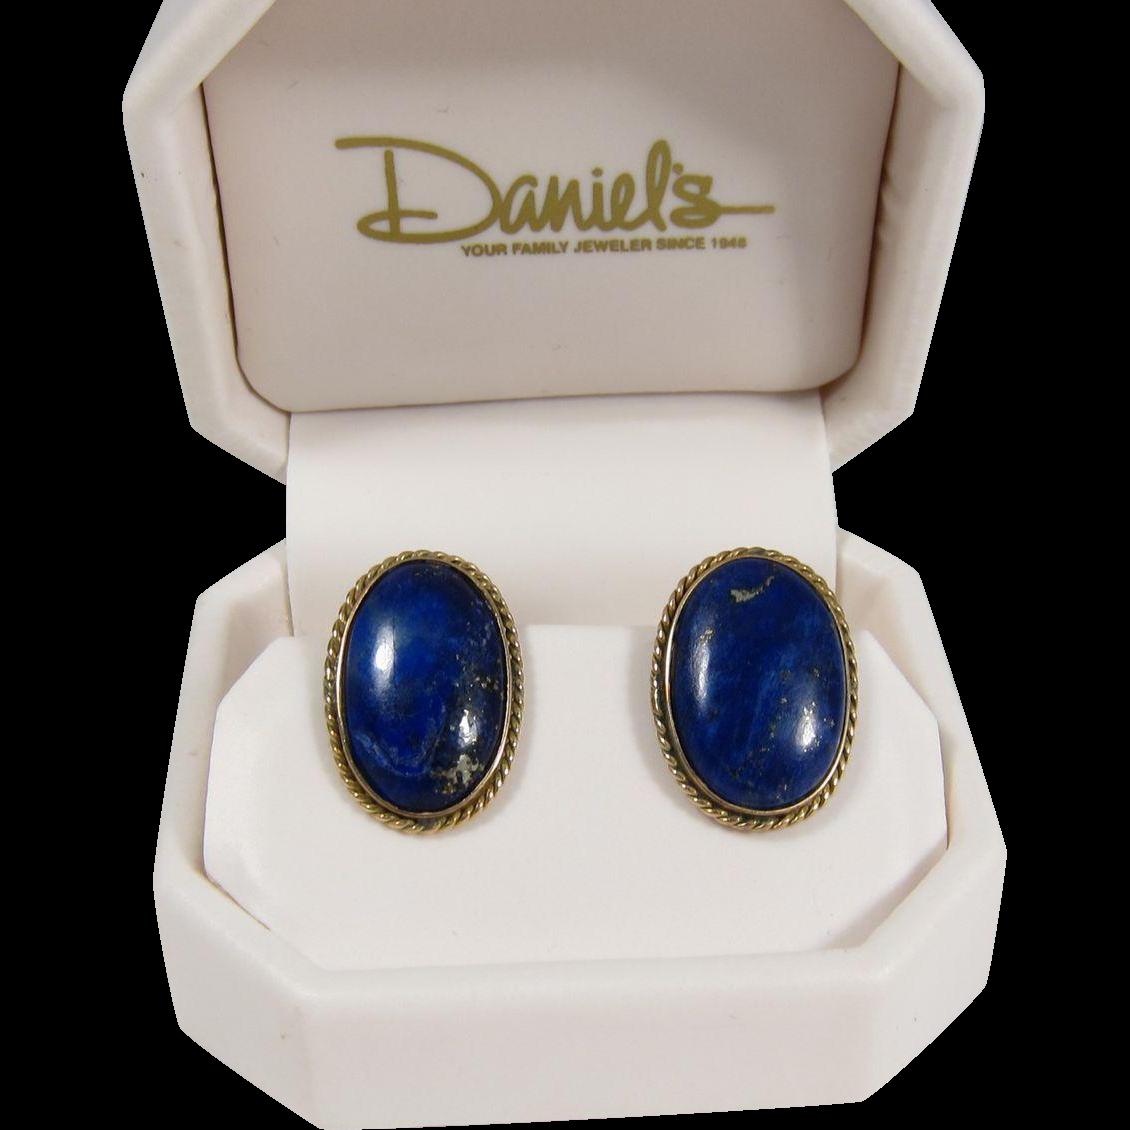 Vintage Lapis Lazuli 14K Yellow Gold & Oval Cabochon Earrings